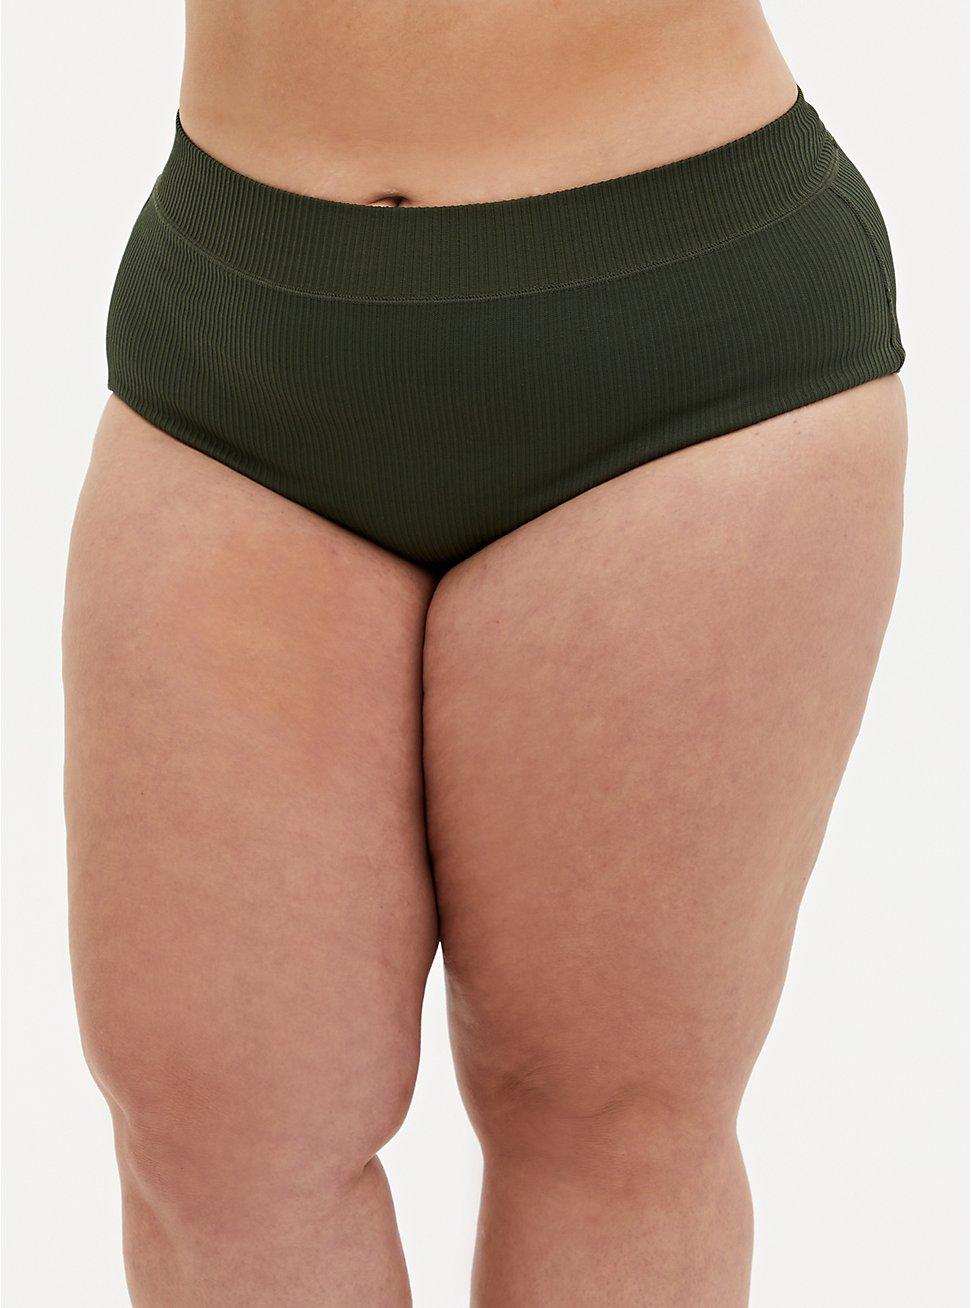 Olive Green Rib Seamless Brief Panty, DEEP DEPTHS, hi-res